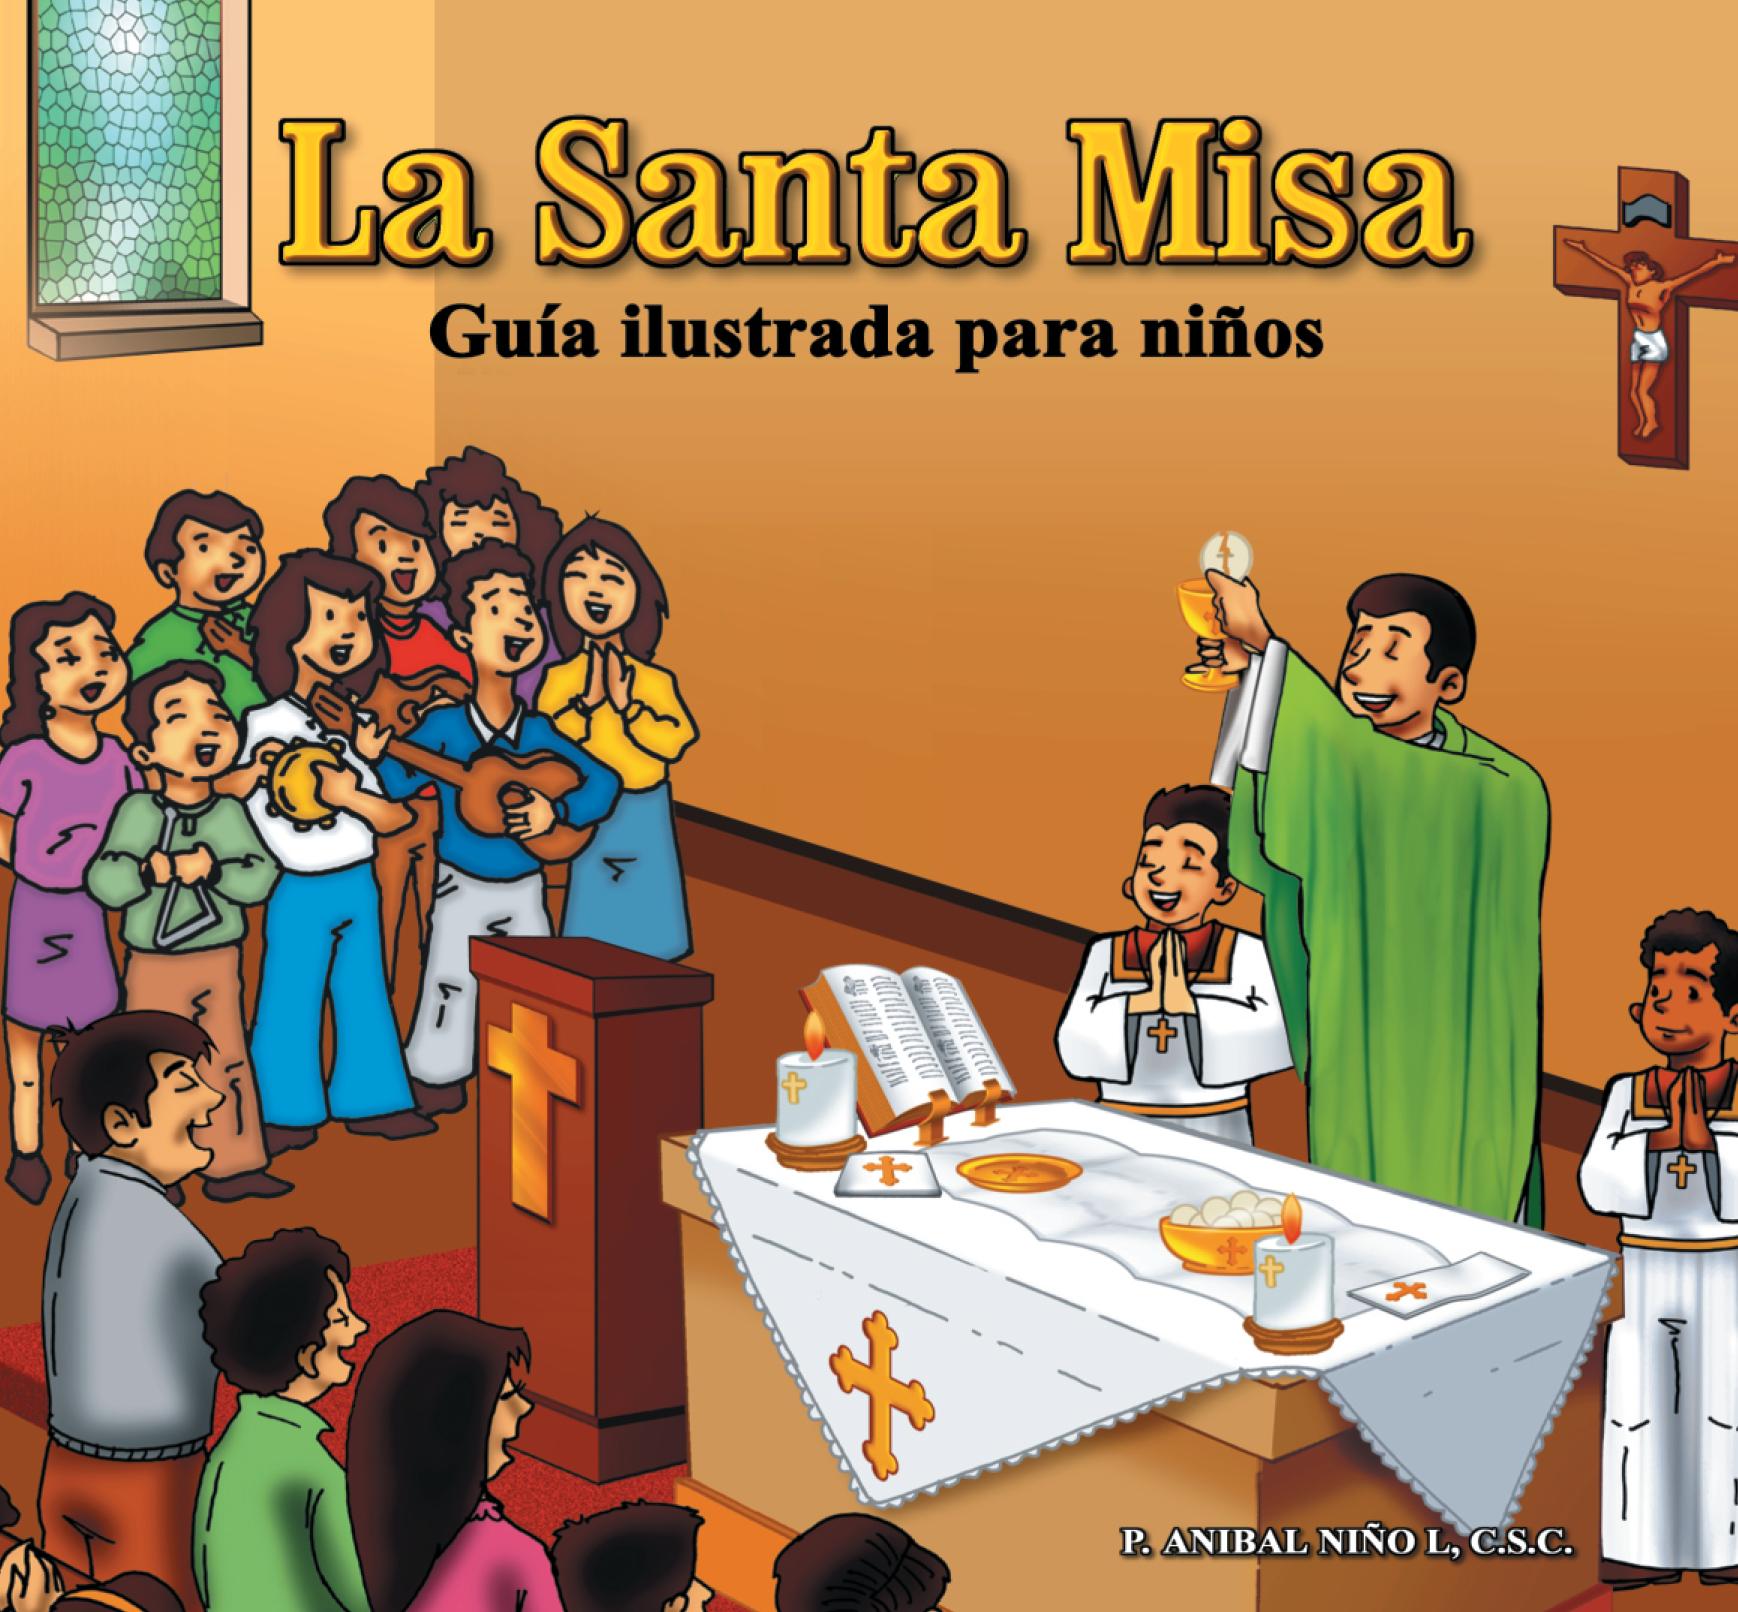 Santa Misa Ilustrada para Niños Image